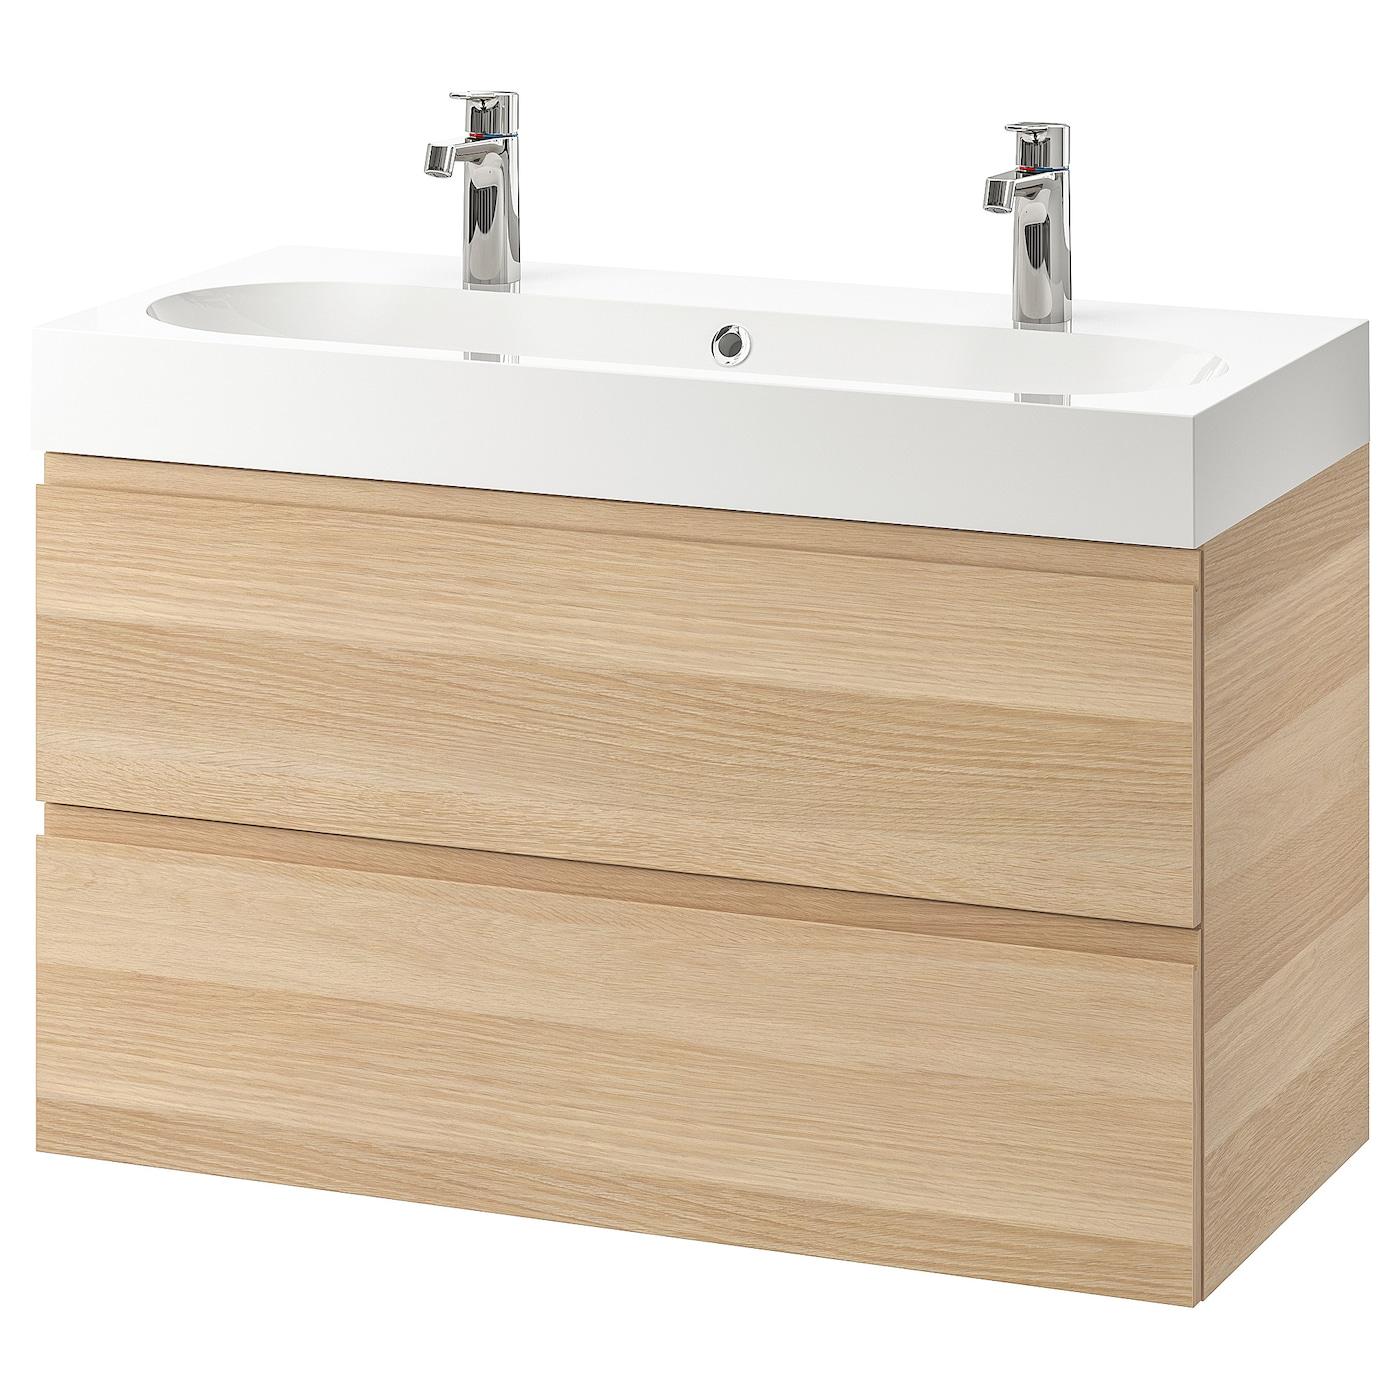 GODMORGON / BRÅVIKEN Armario lavabo 17 cajones - efecto roble tinte blanco,  grifo Brogrund 17x17x17 cm